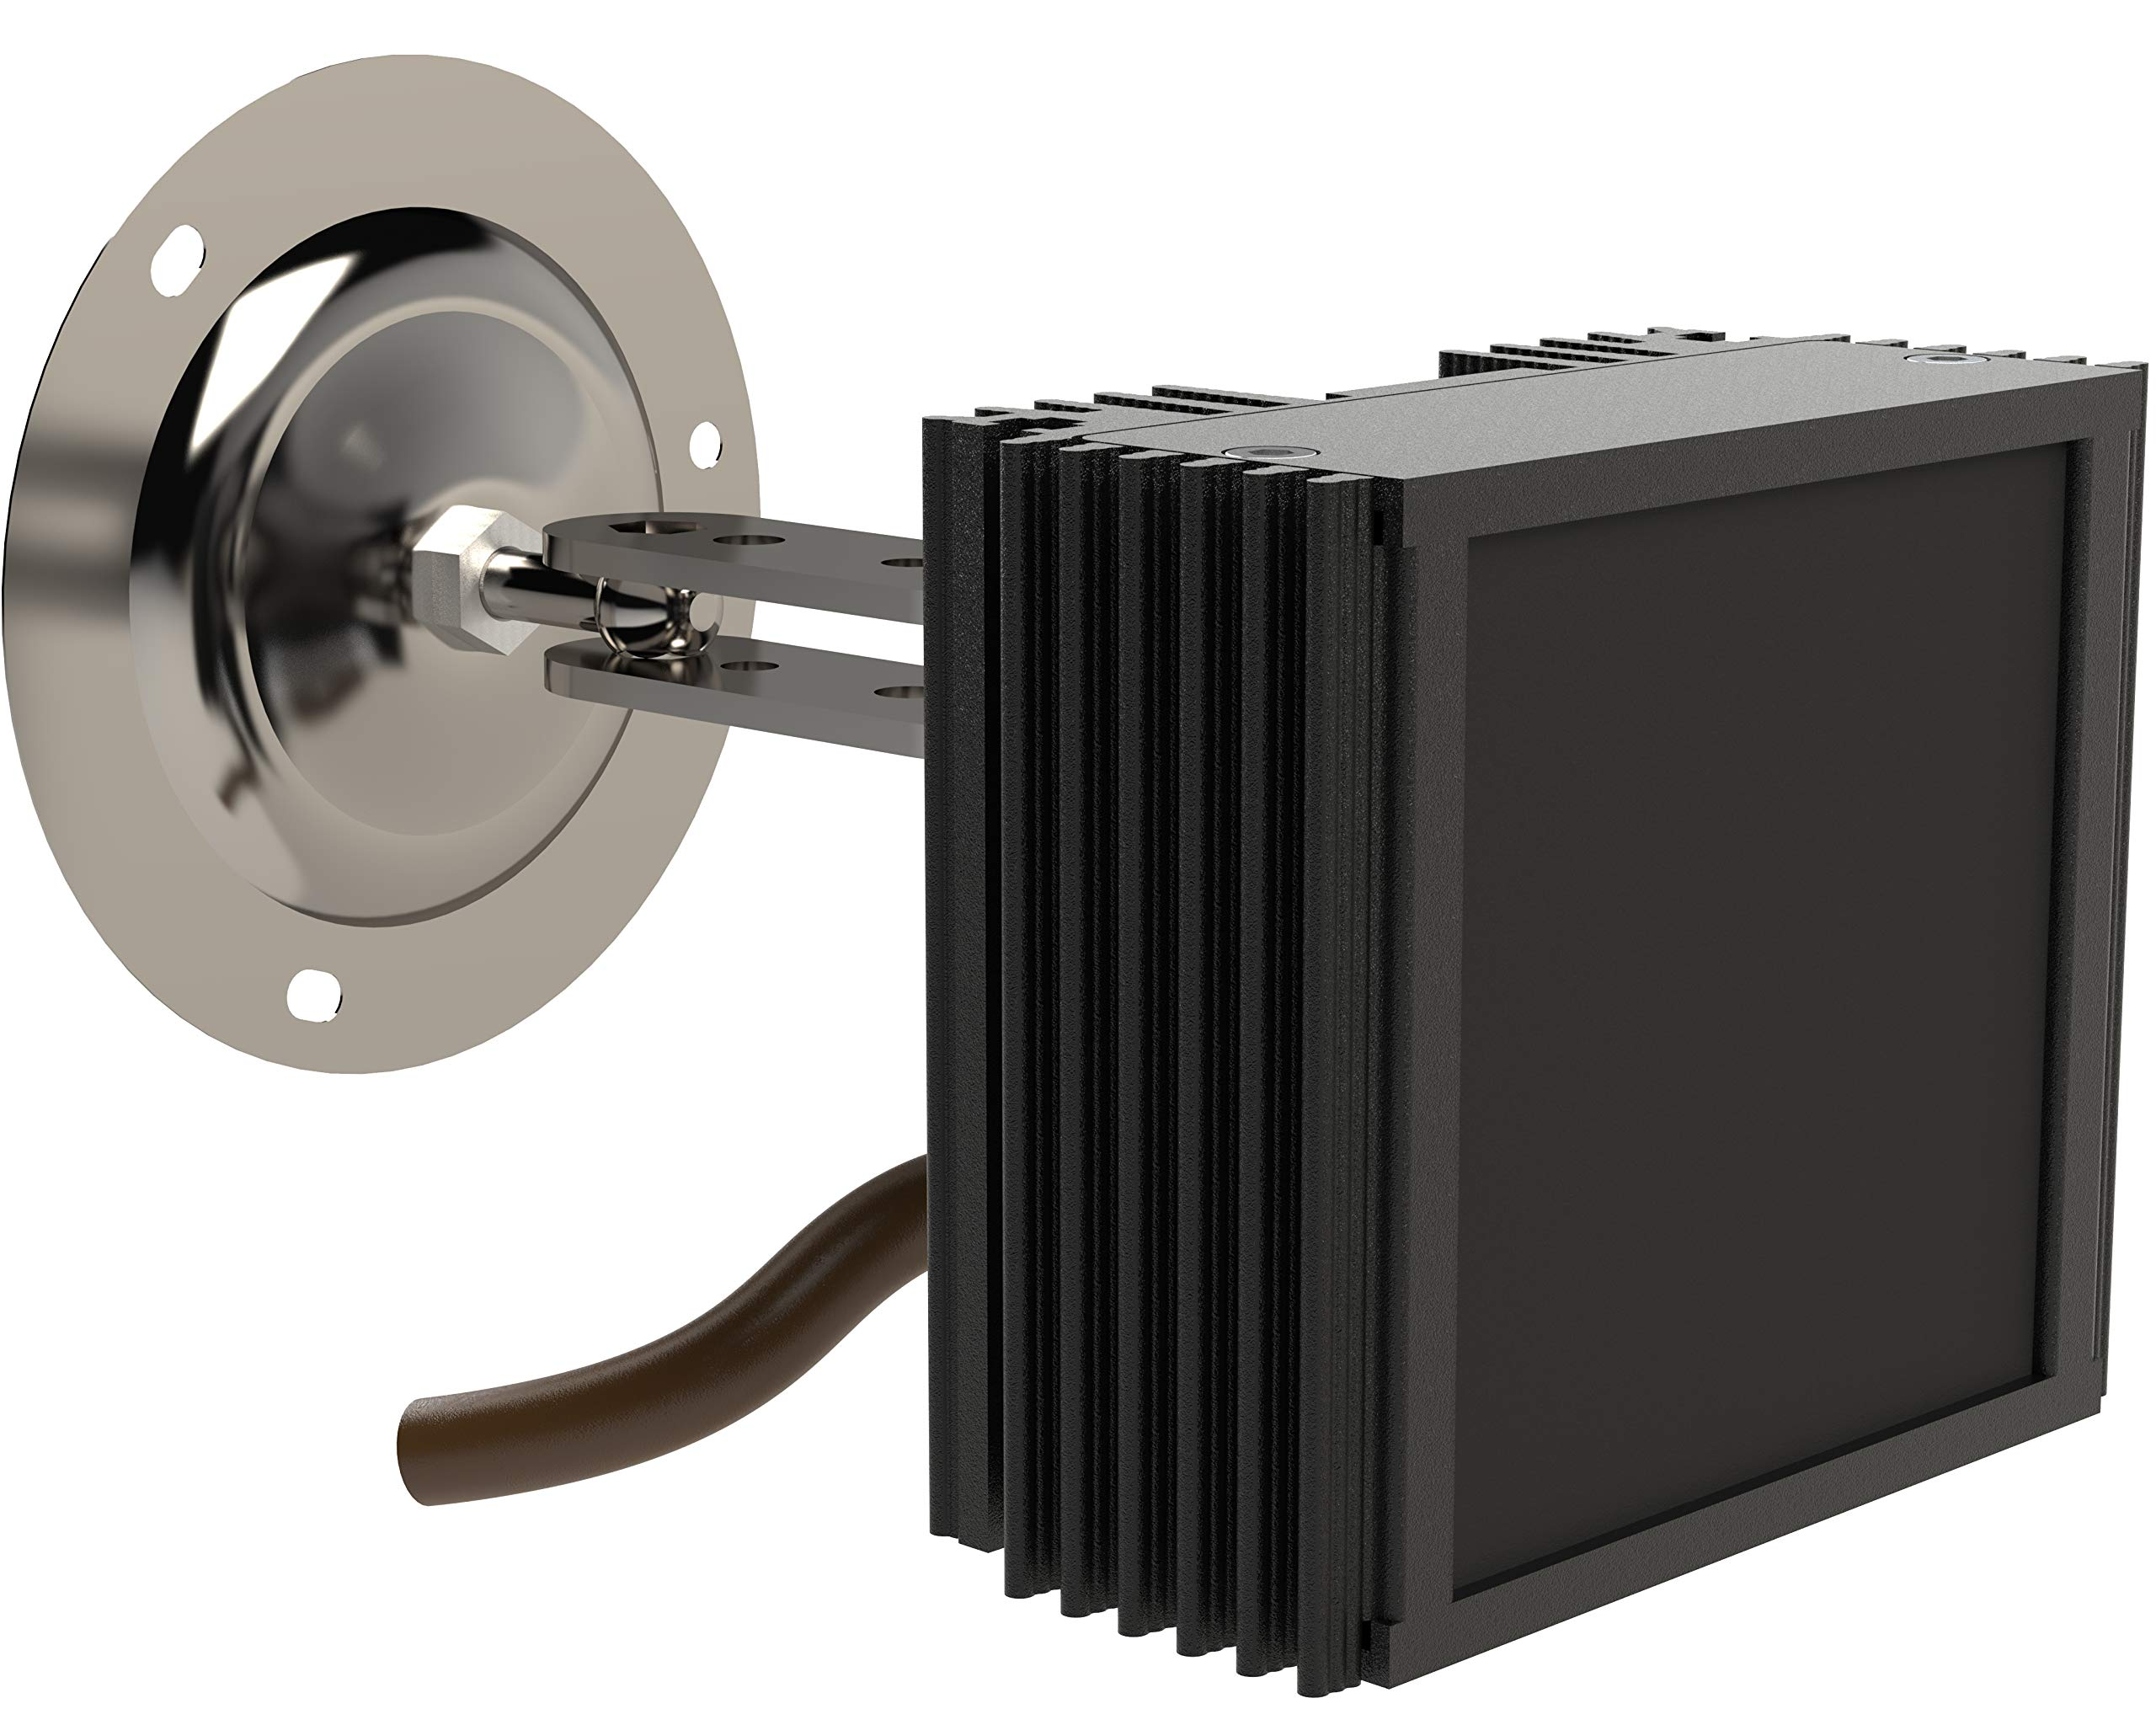 Infrared Illuminator Microlight IR Helios M-30/100 30deg Narrow Angle up to 250ft Night Vision Outdoor IP67